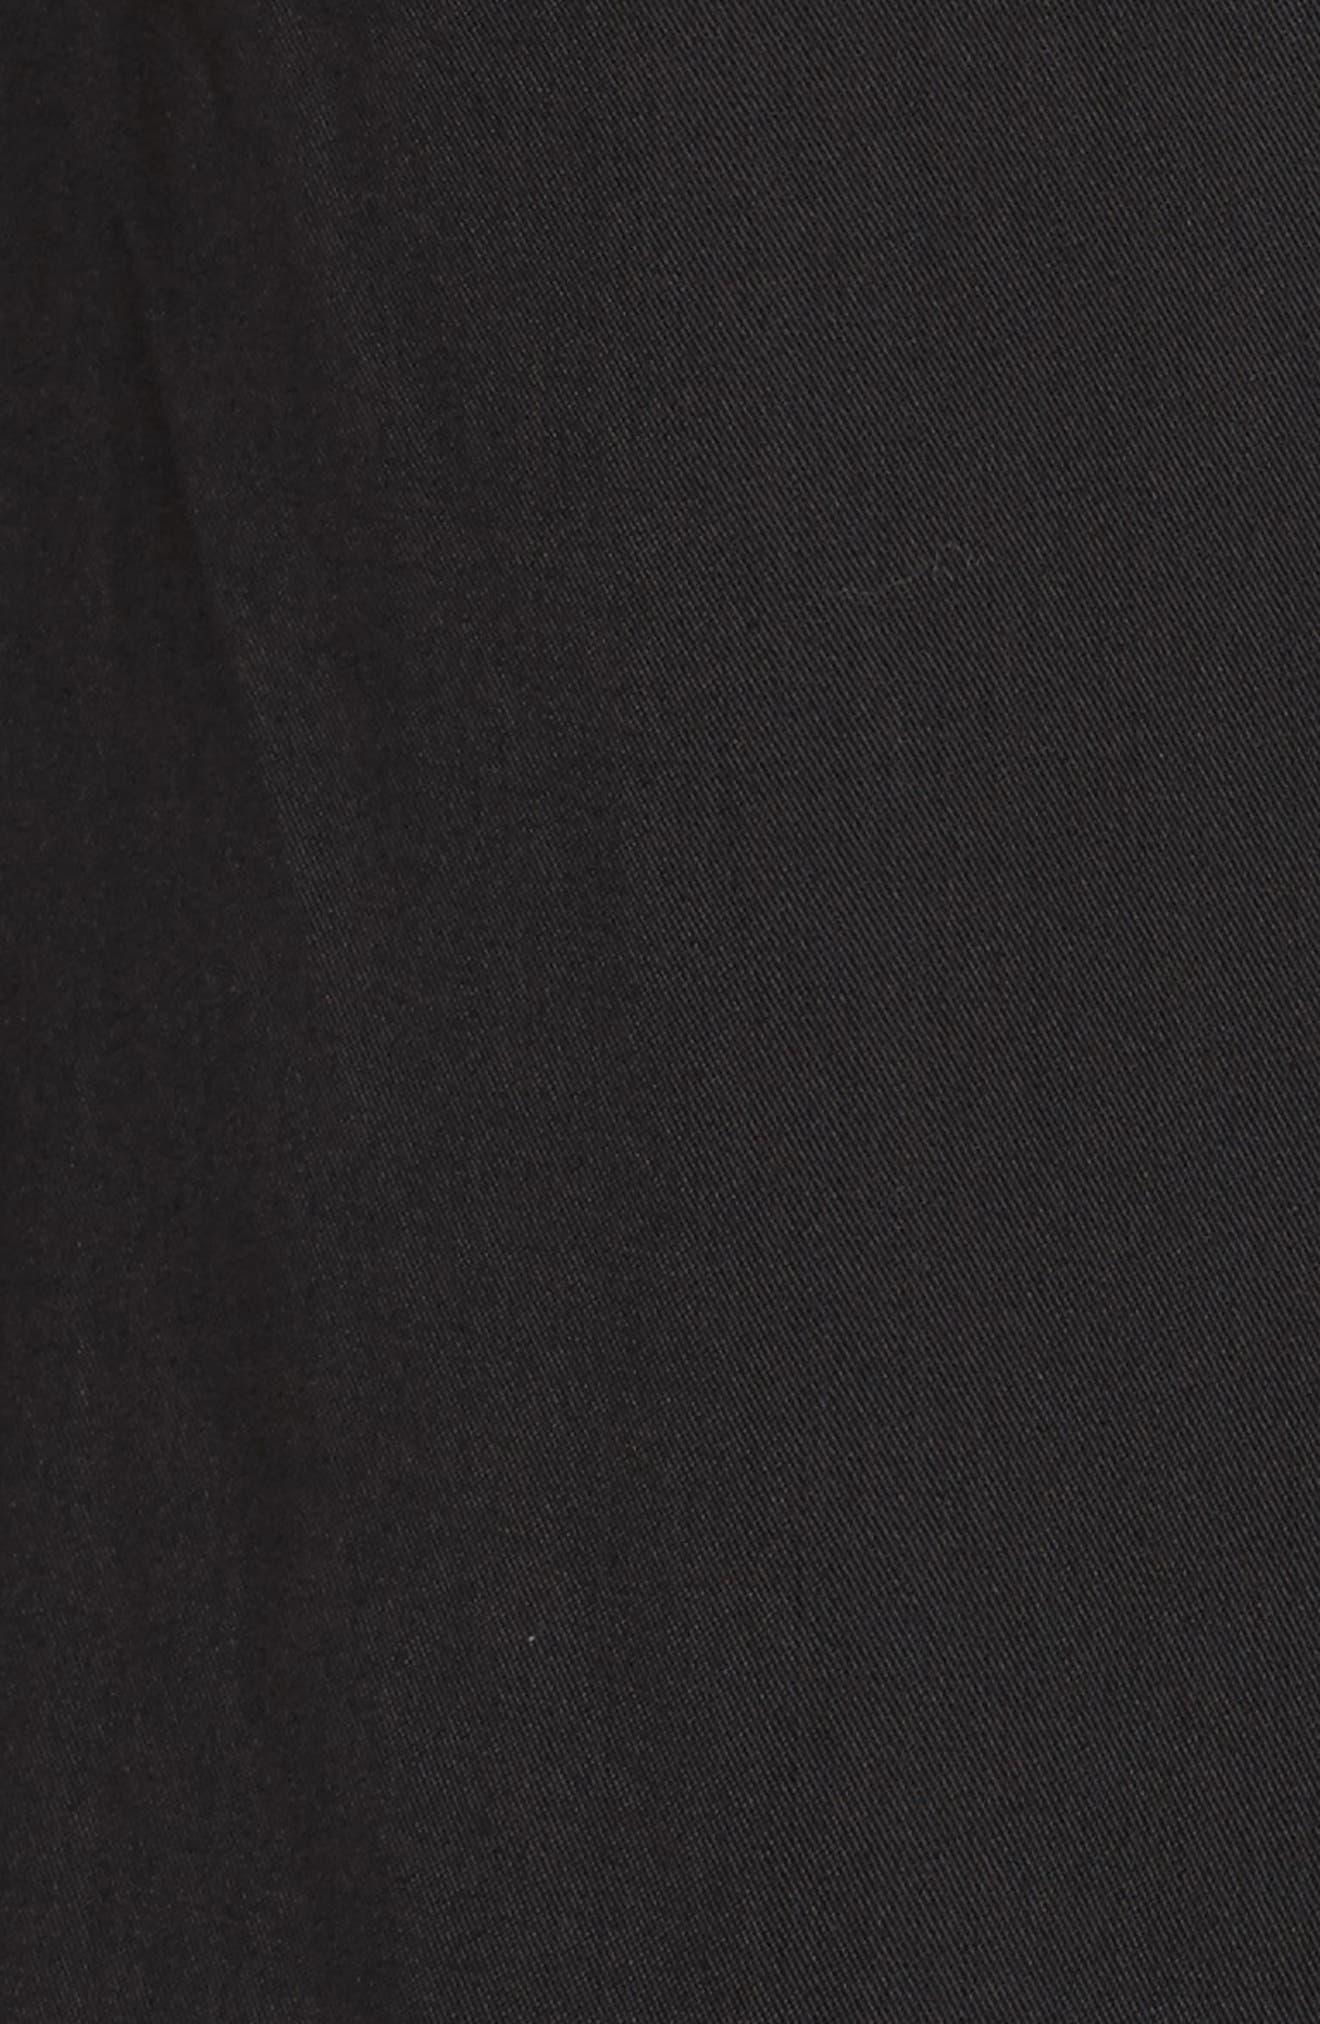 Blank Noir Hooded Water Resistant Anorak,                             Alternate thumbnail 7, color,                             001